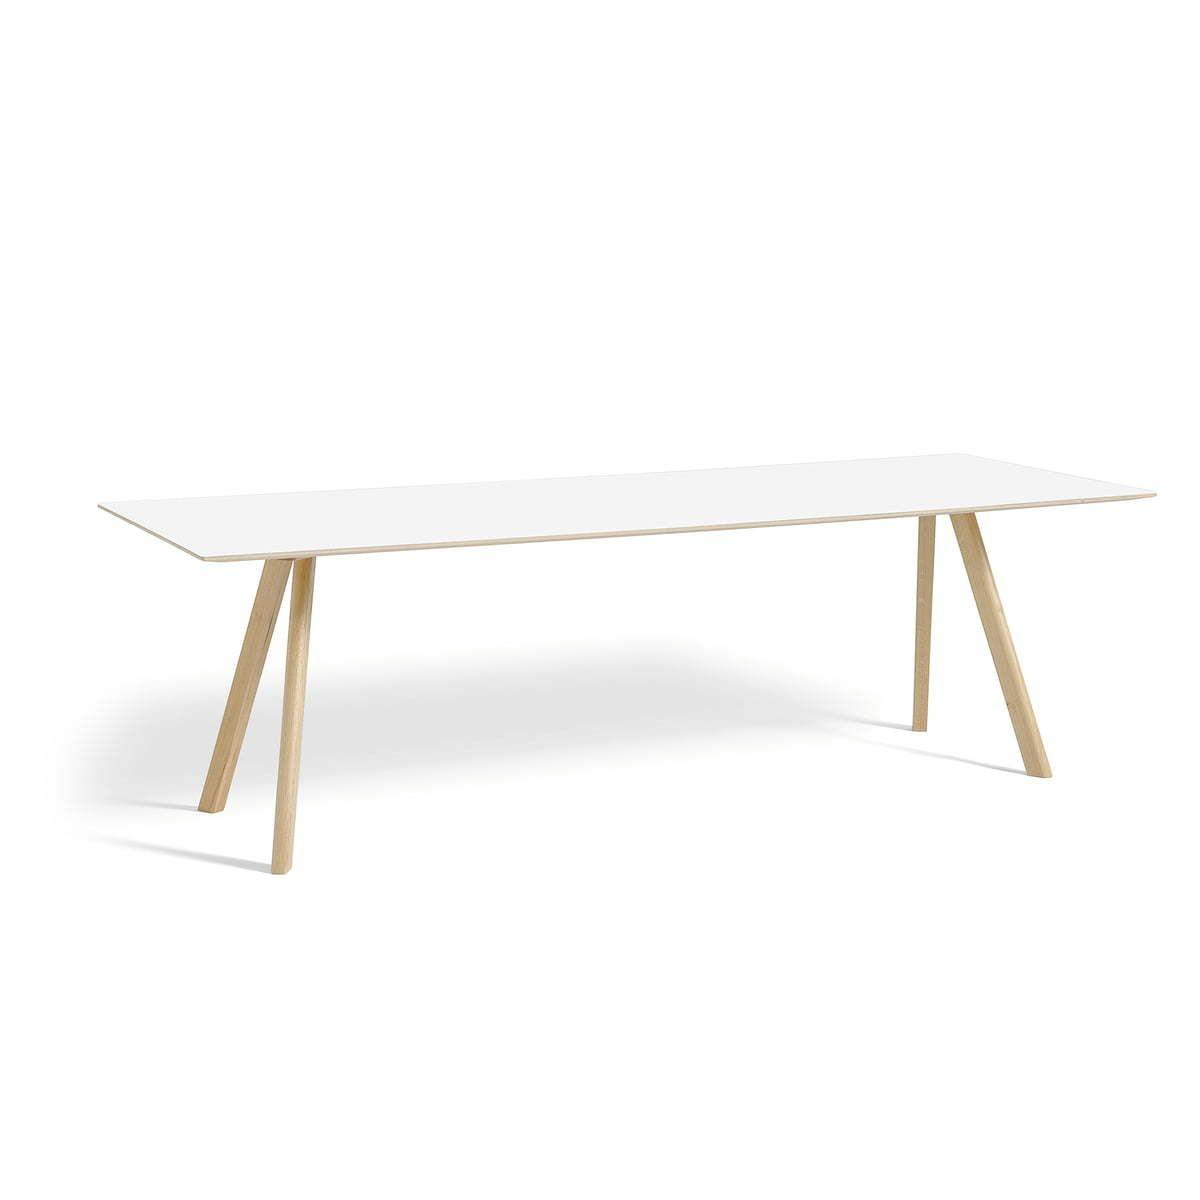 Tischplatte weiß matt  Hay - Copenhague CPH30 Esstisch 250 x 90 cm, Eiche matt lackiert ...